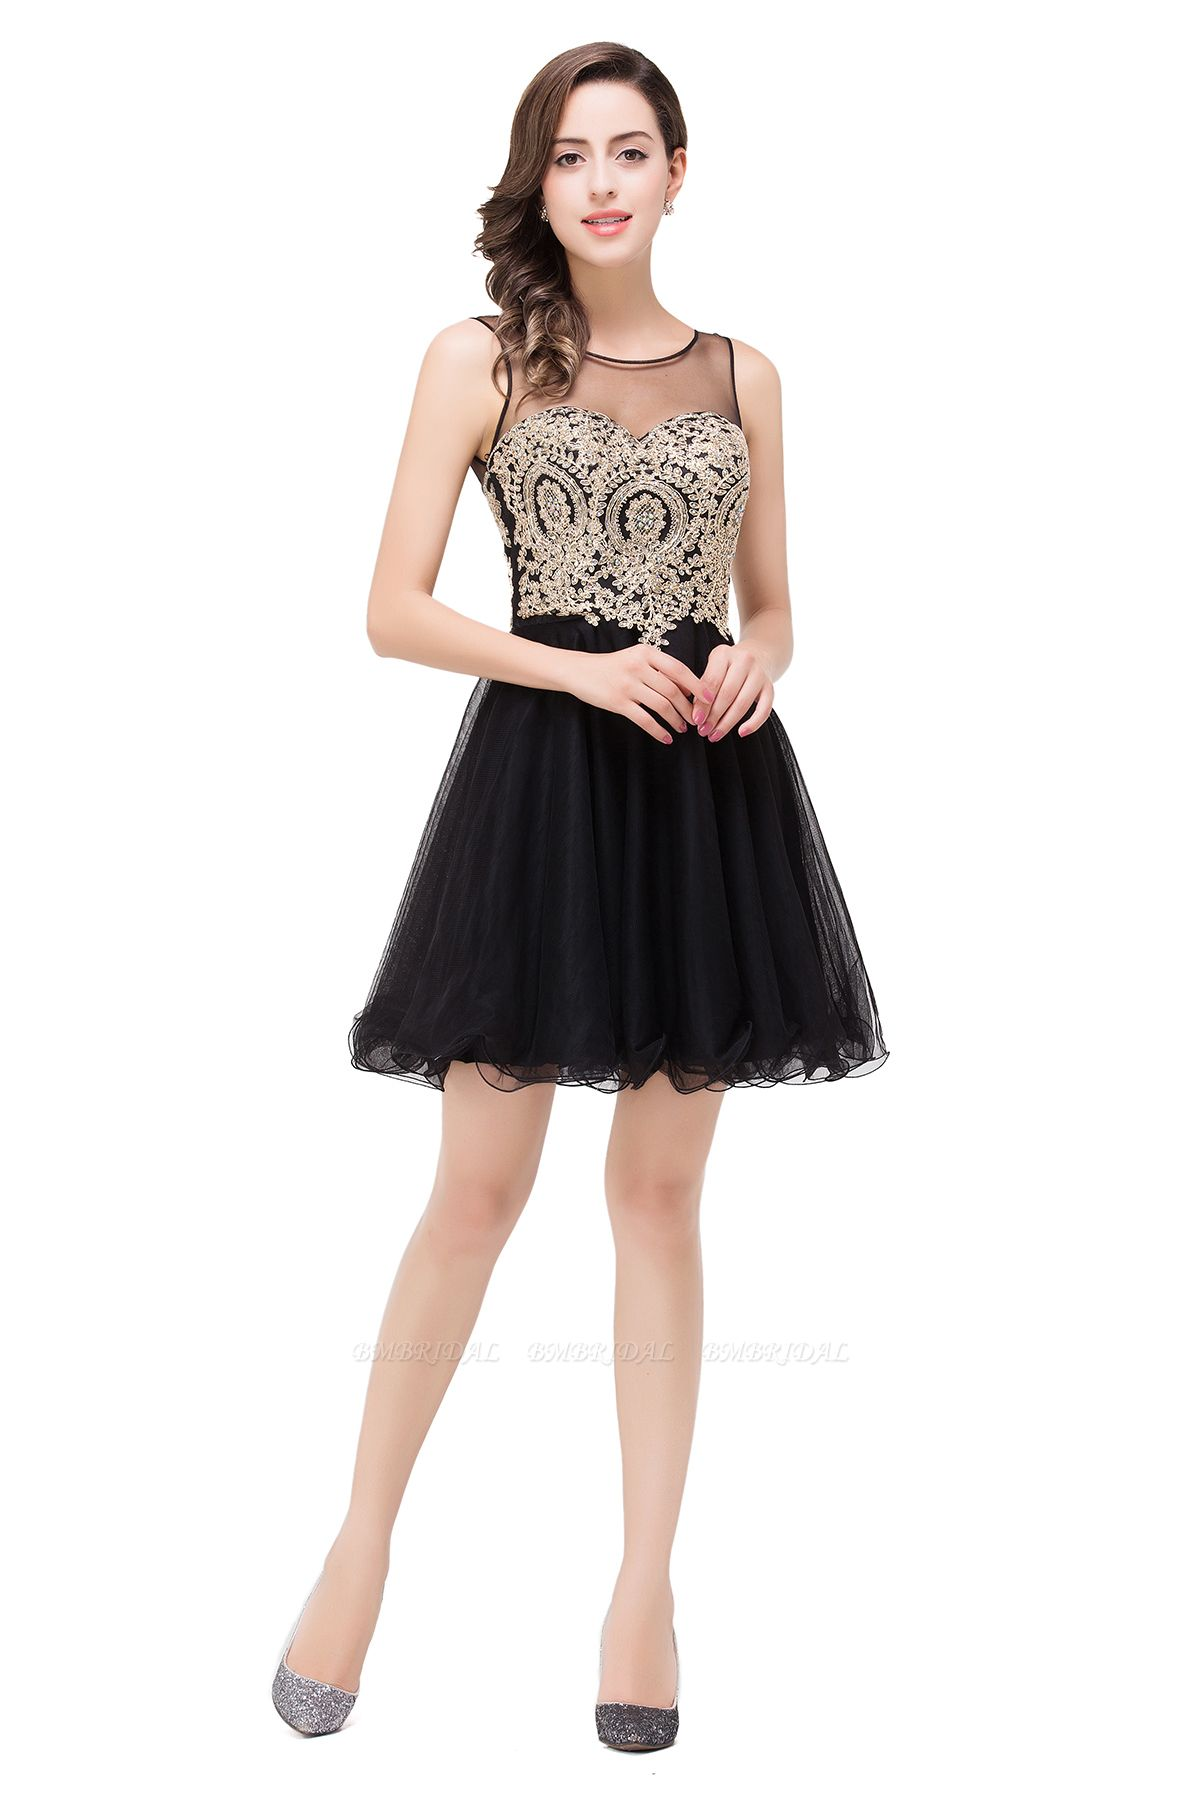 BMbridal Short A-line Sleeveless Little Black Dress Online